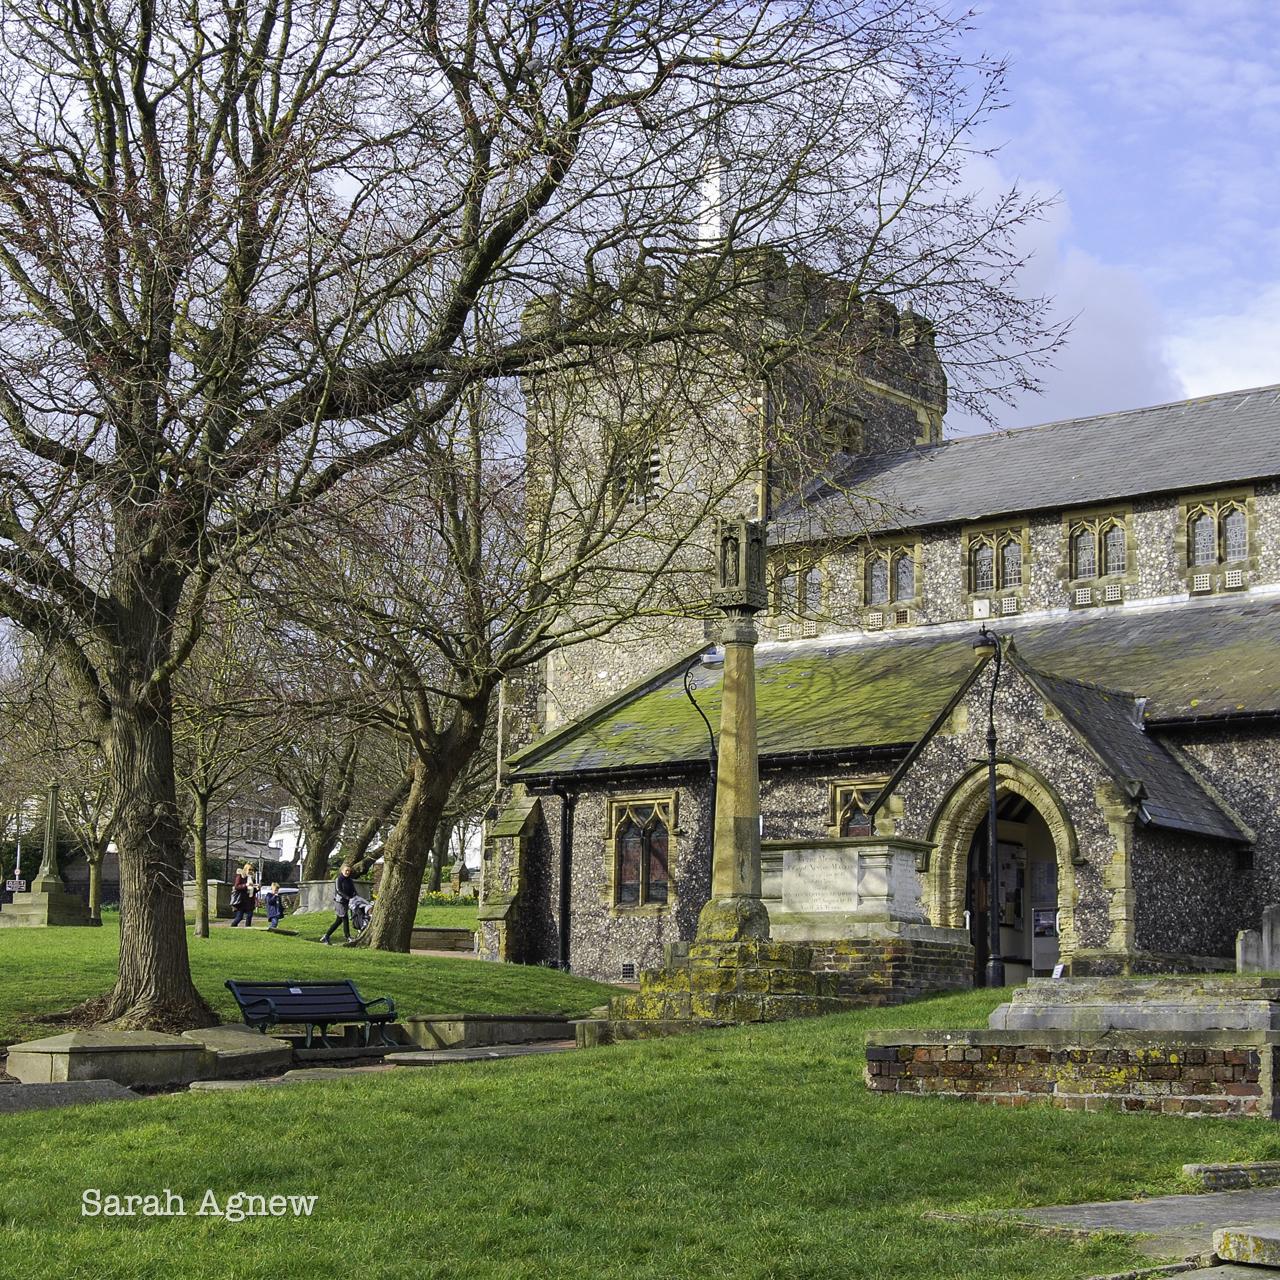 St Nicholas Church Brighton and the Eighteenth Century, photo by Sarah Agnew